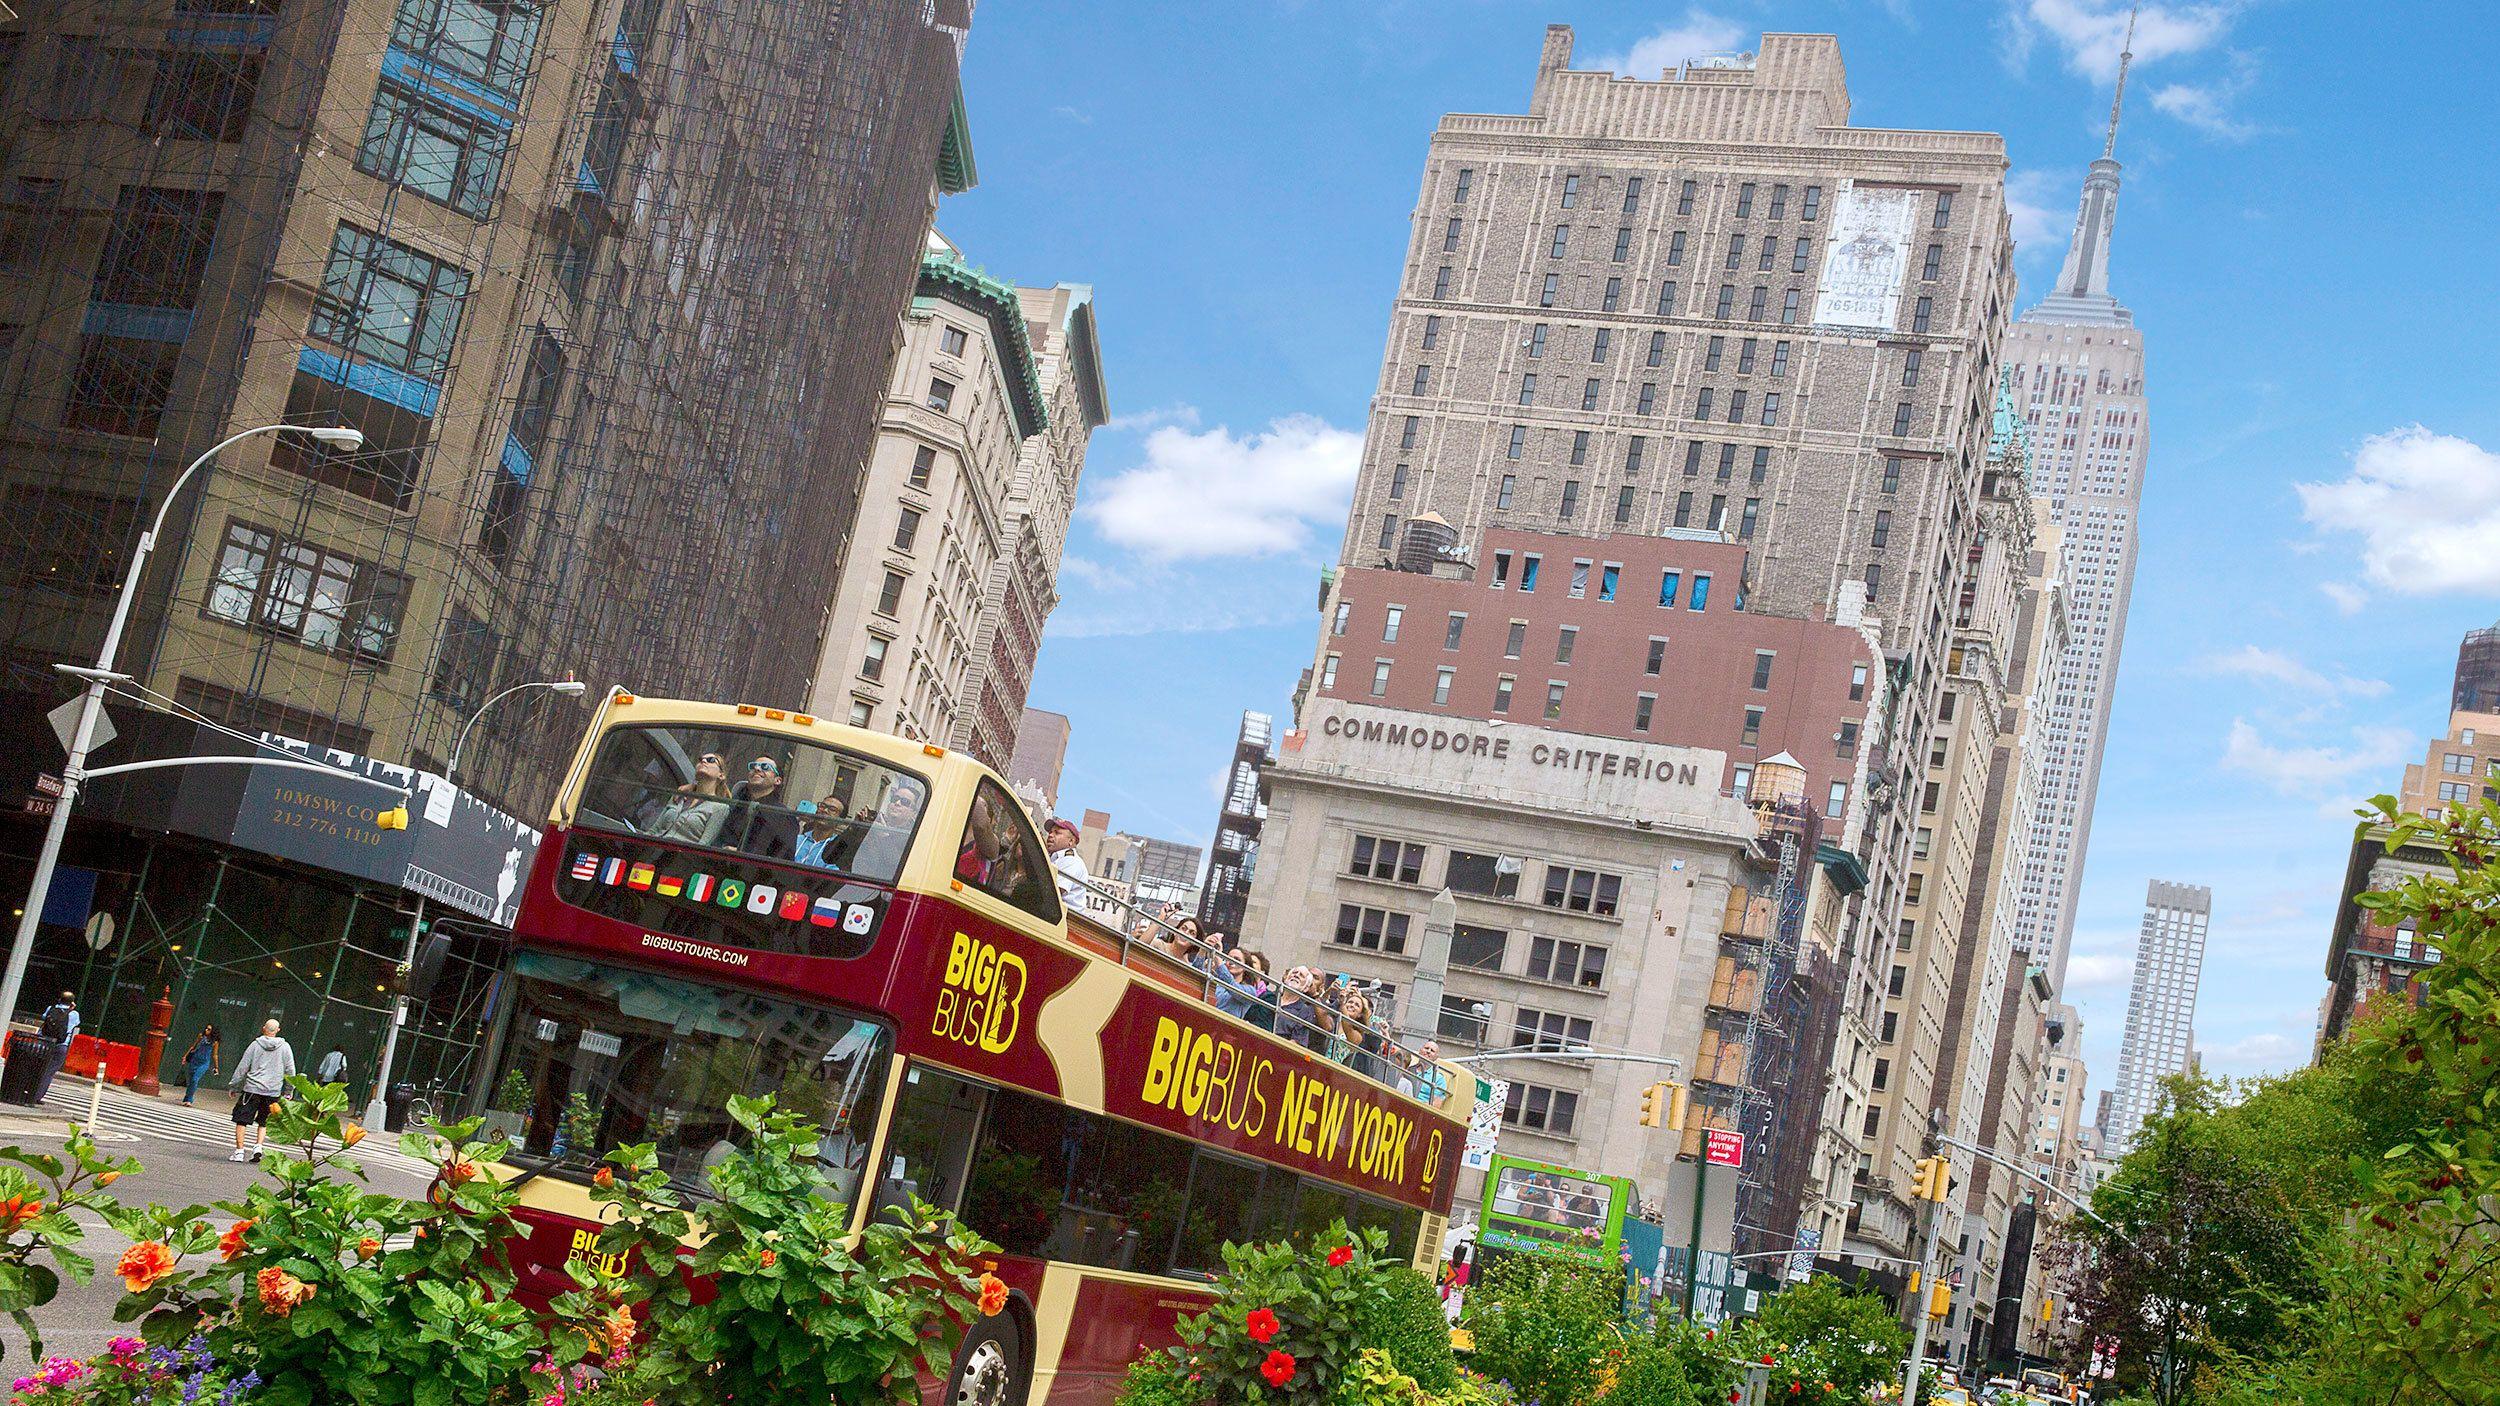 Double decker bus in New York City